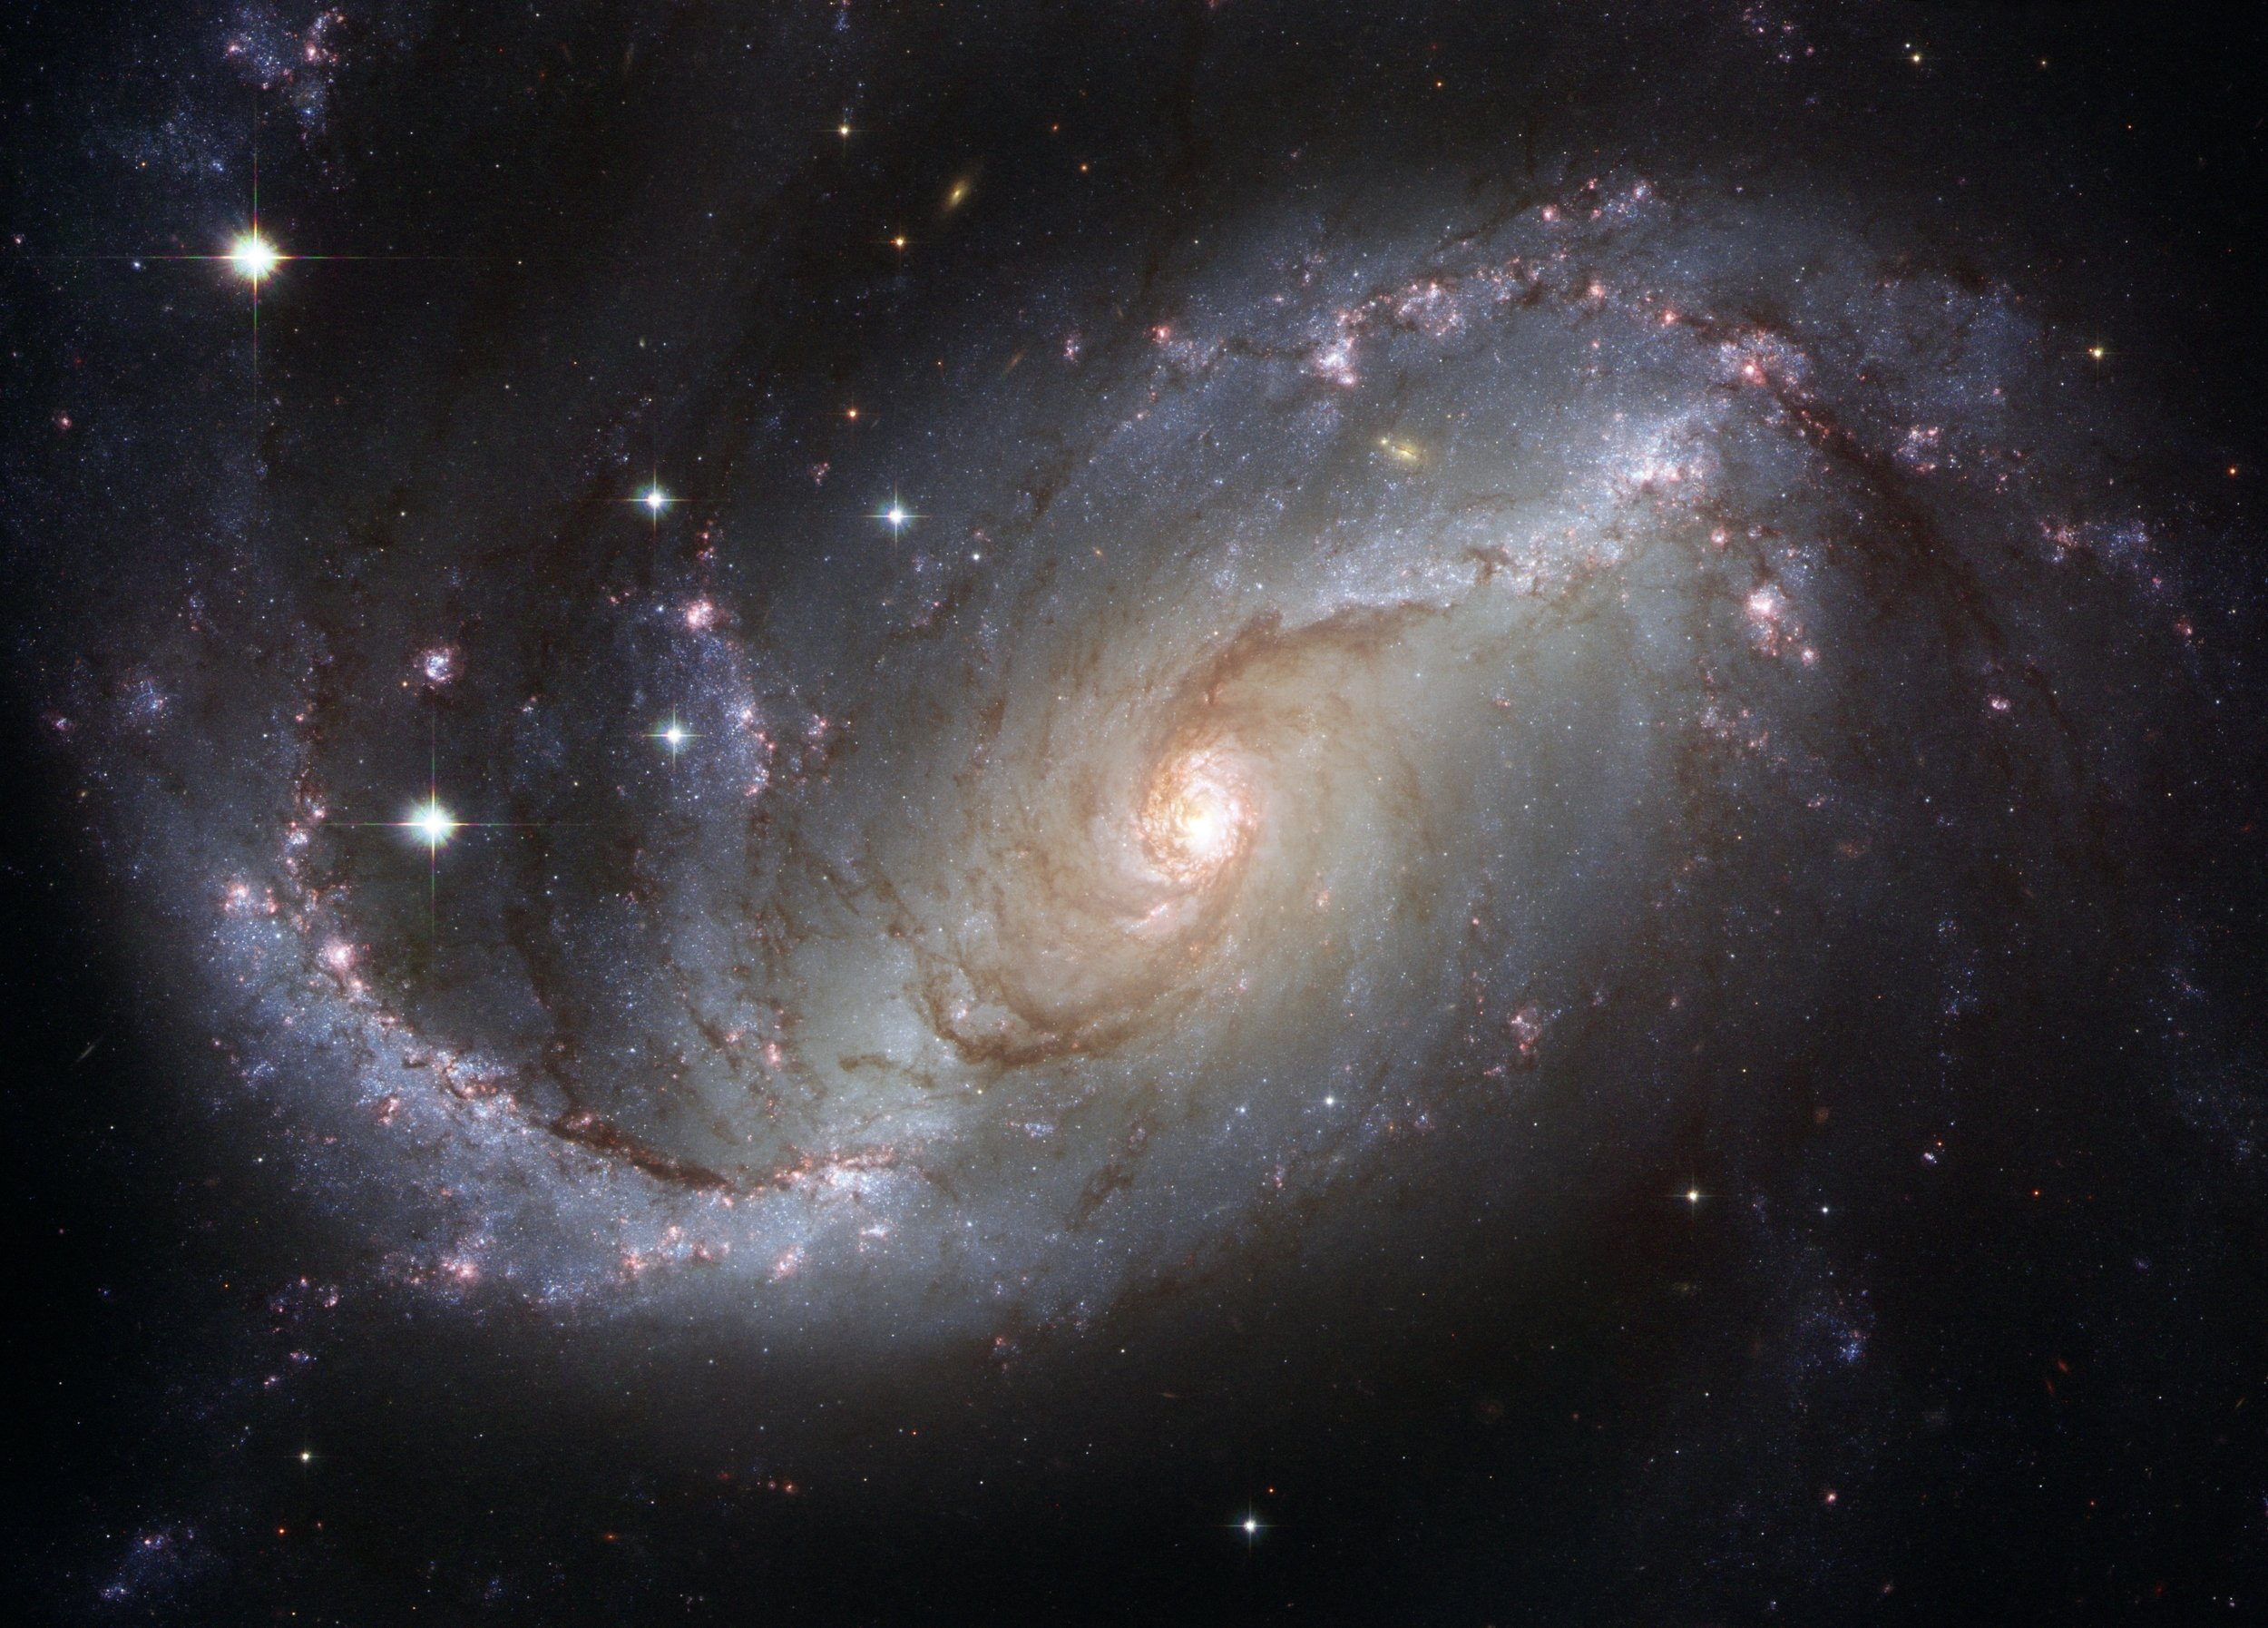 sky-space-dark-galaxy.jpg